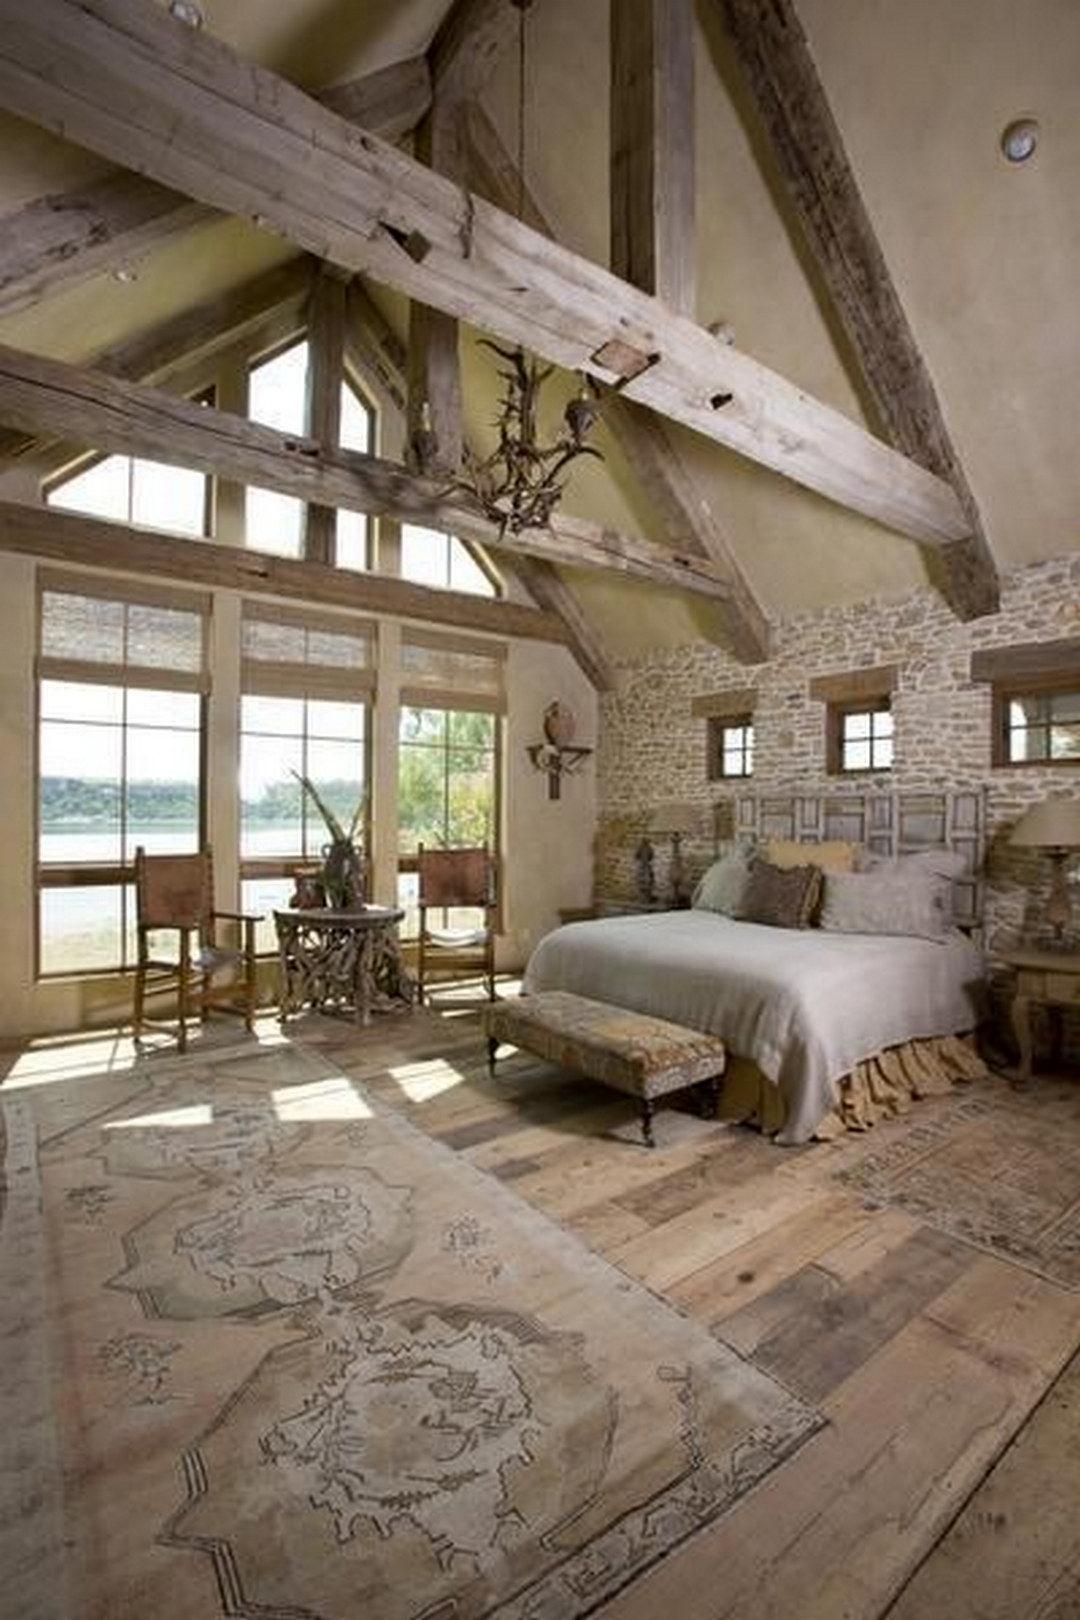 Awesome Barn Style Interior Design Idea (33)